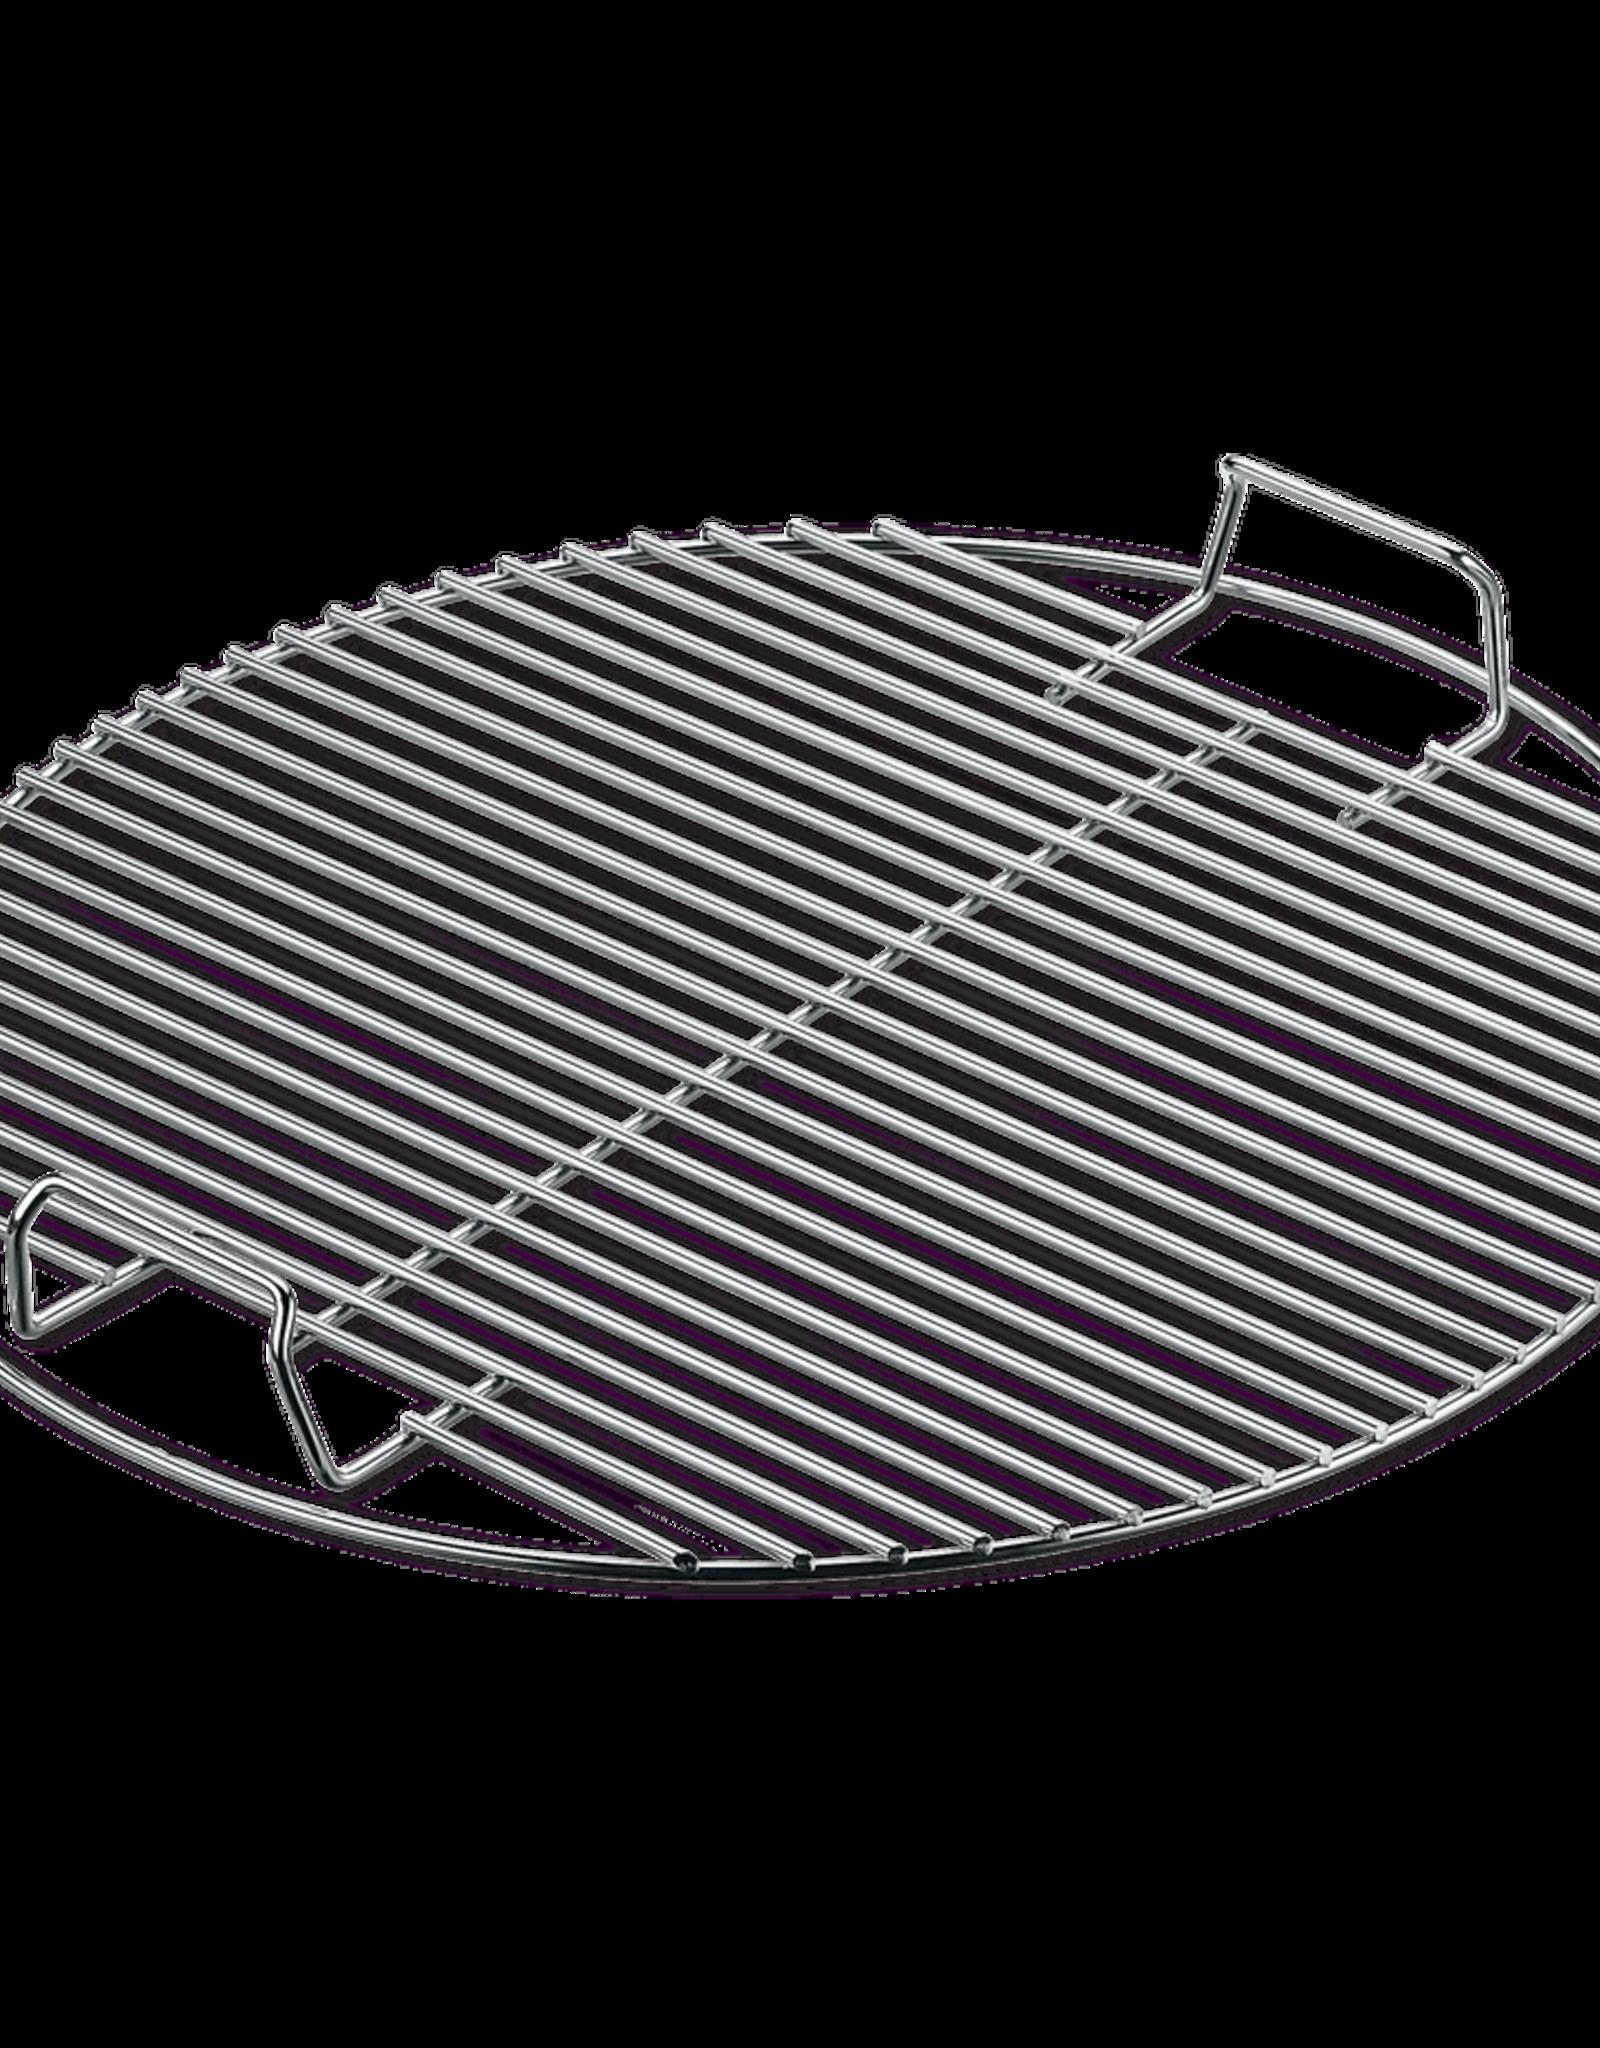 "Weber Cooking Grate - Fits 18'' (not Smokey Mountain Cookerâ""¢ Smoker)"